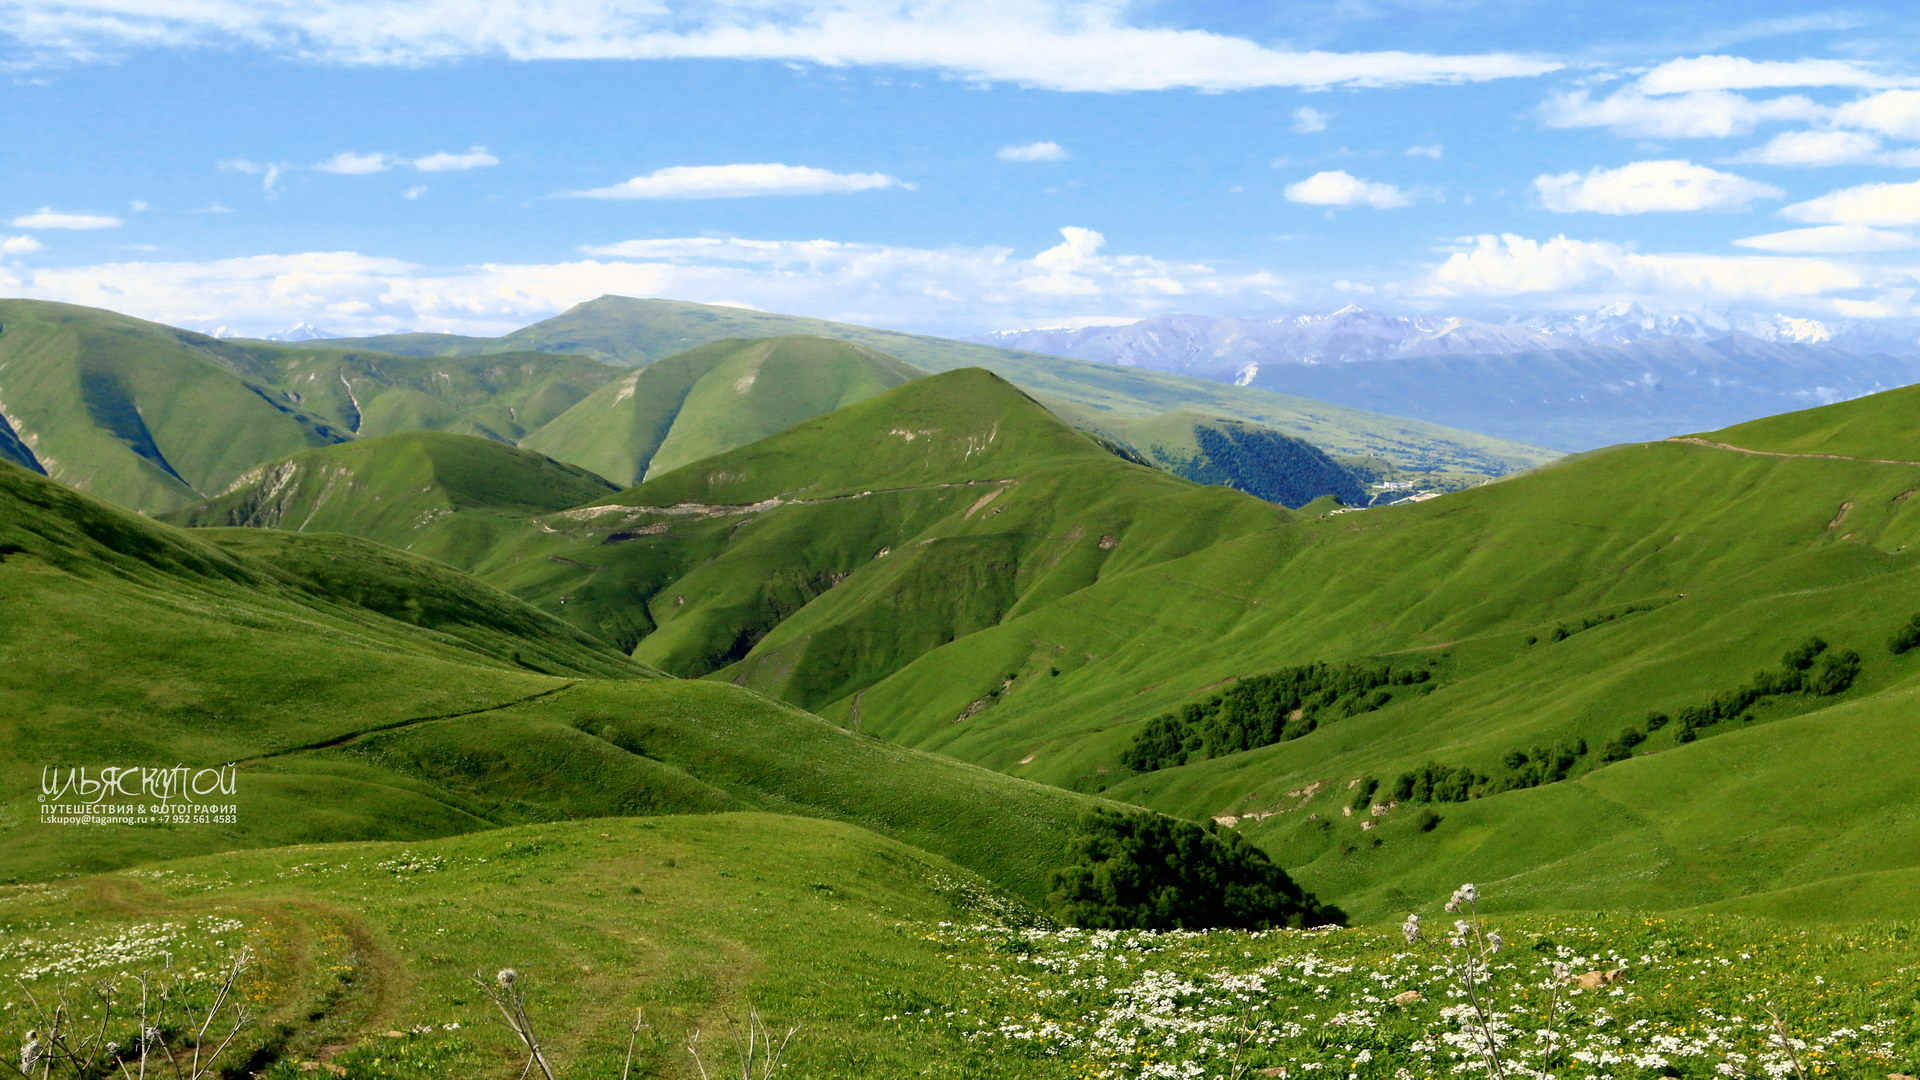 http://ws.pp.ru/foto/200123.Dagestan1.1920x1080.02.JPG